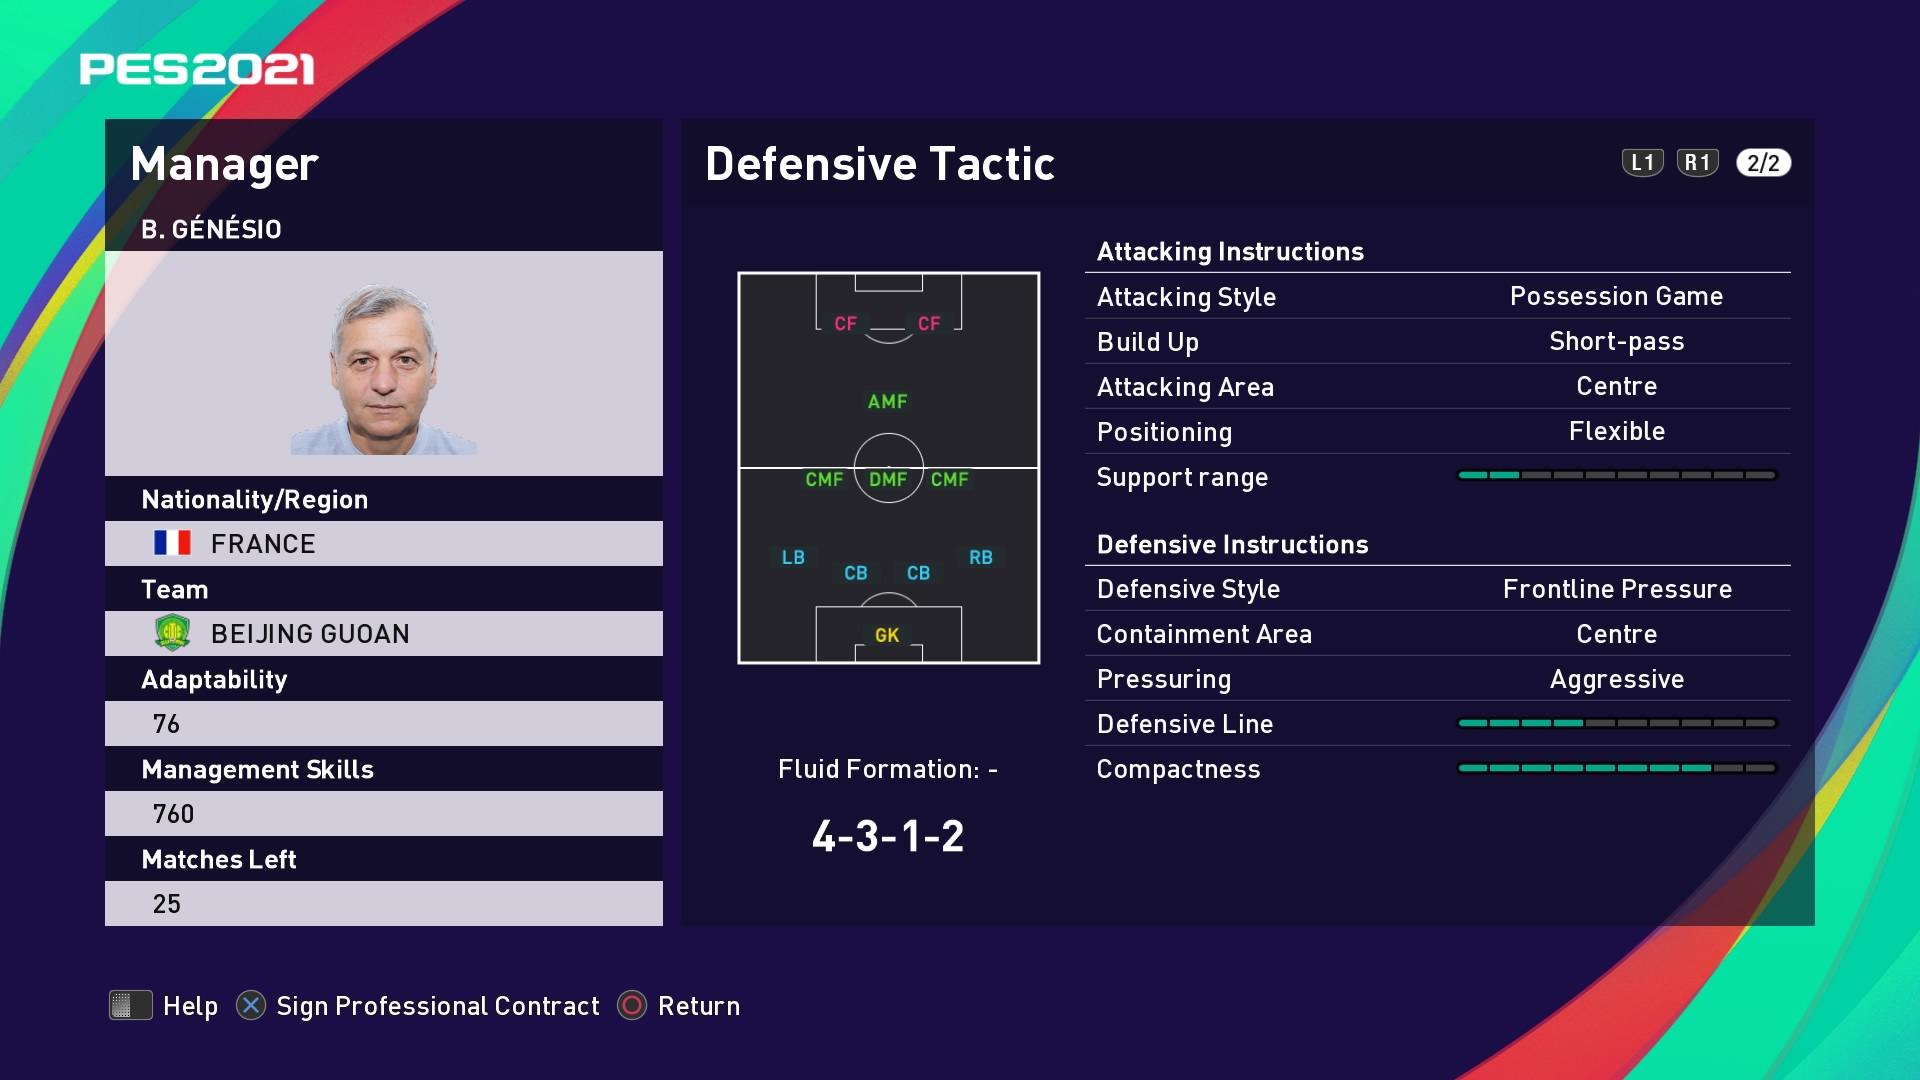 B. Génésio (Bruno Génésio) Defensive Tactic in PES 2021 myClub